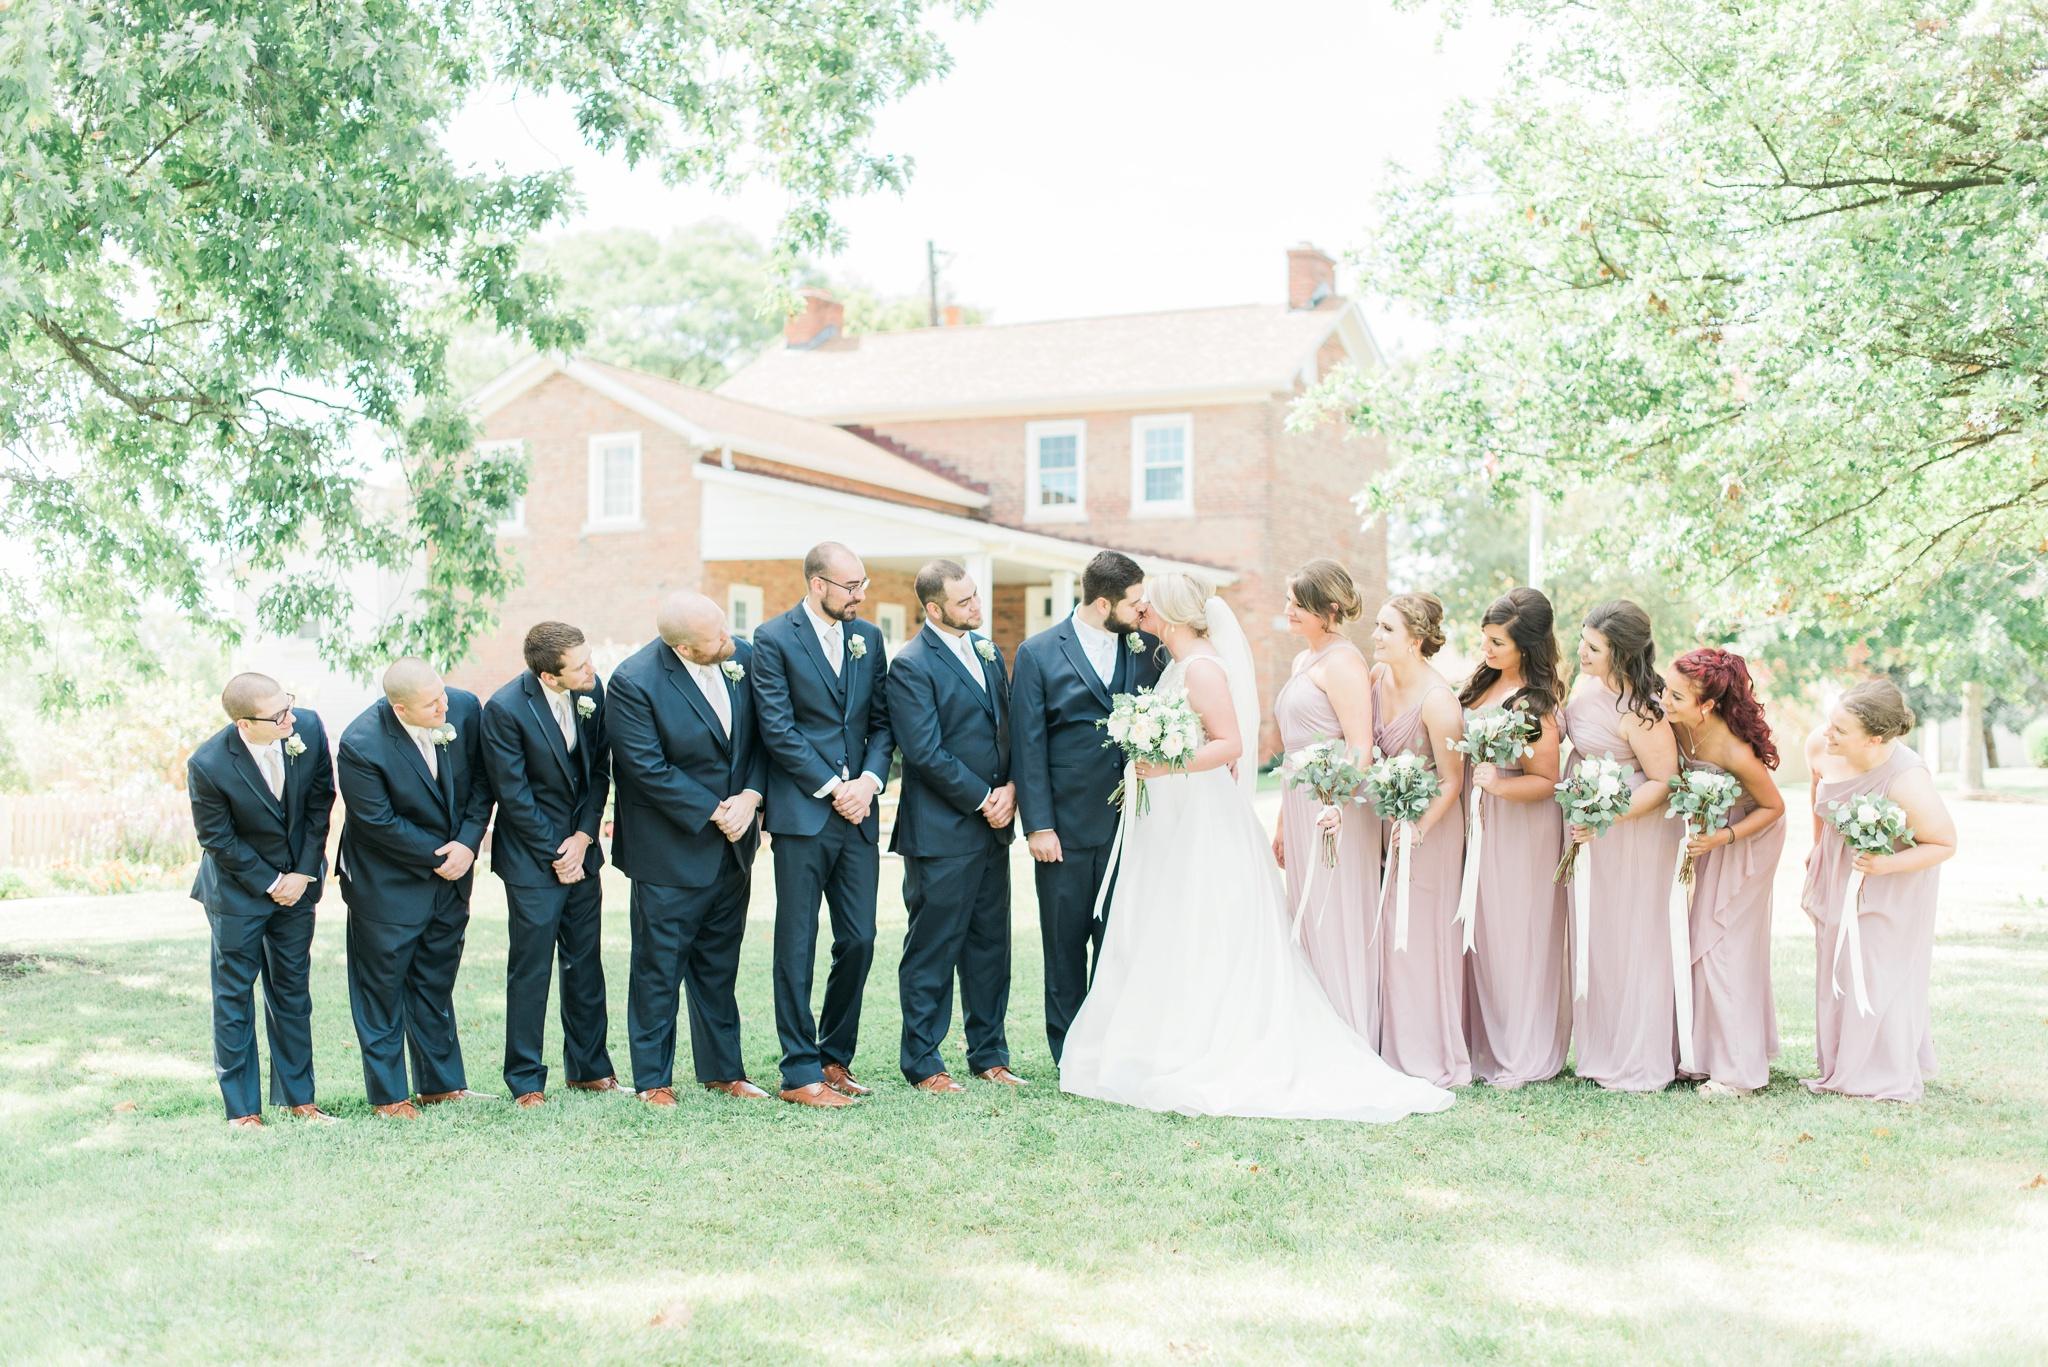 aladdin-shrine-center-wedding-grove-city-ohio-amber-jared_0054.jpg